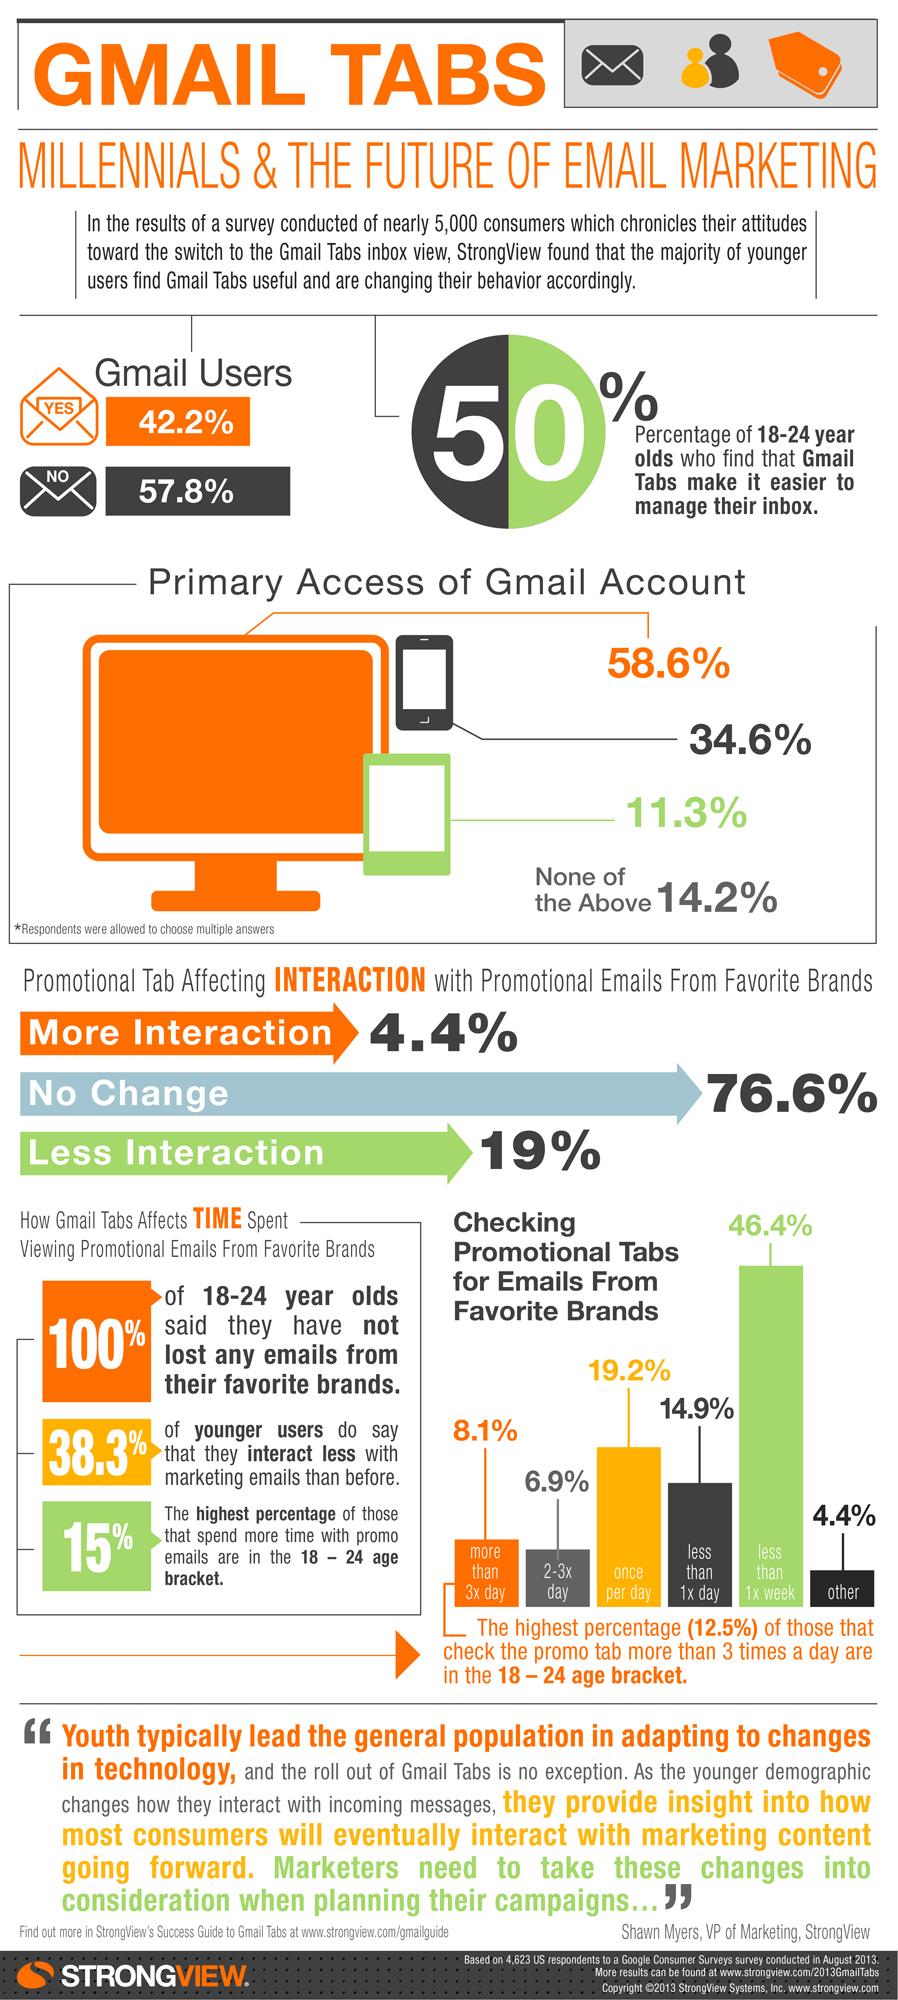 StrongView_Gmail_Inbox_Tabs_Infographic.jpg